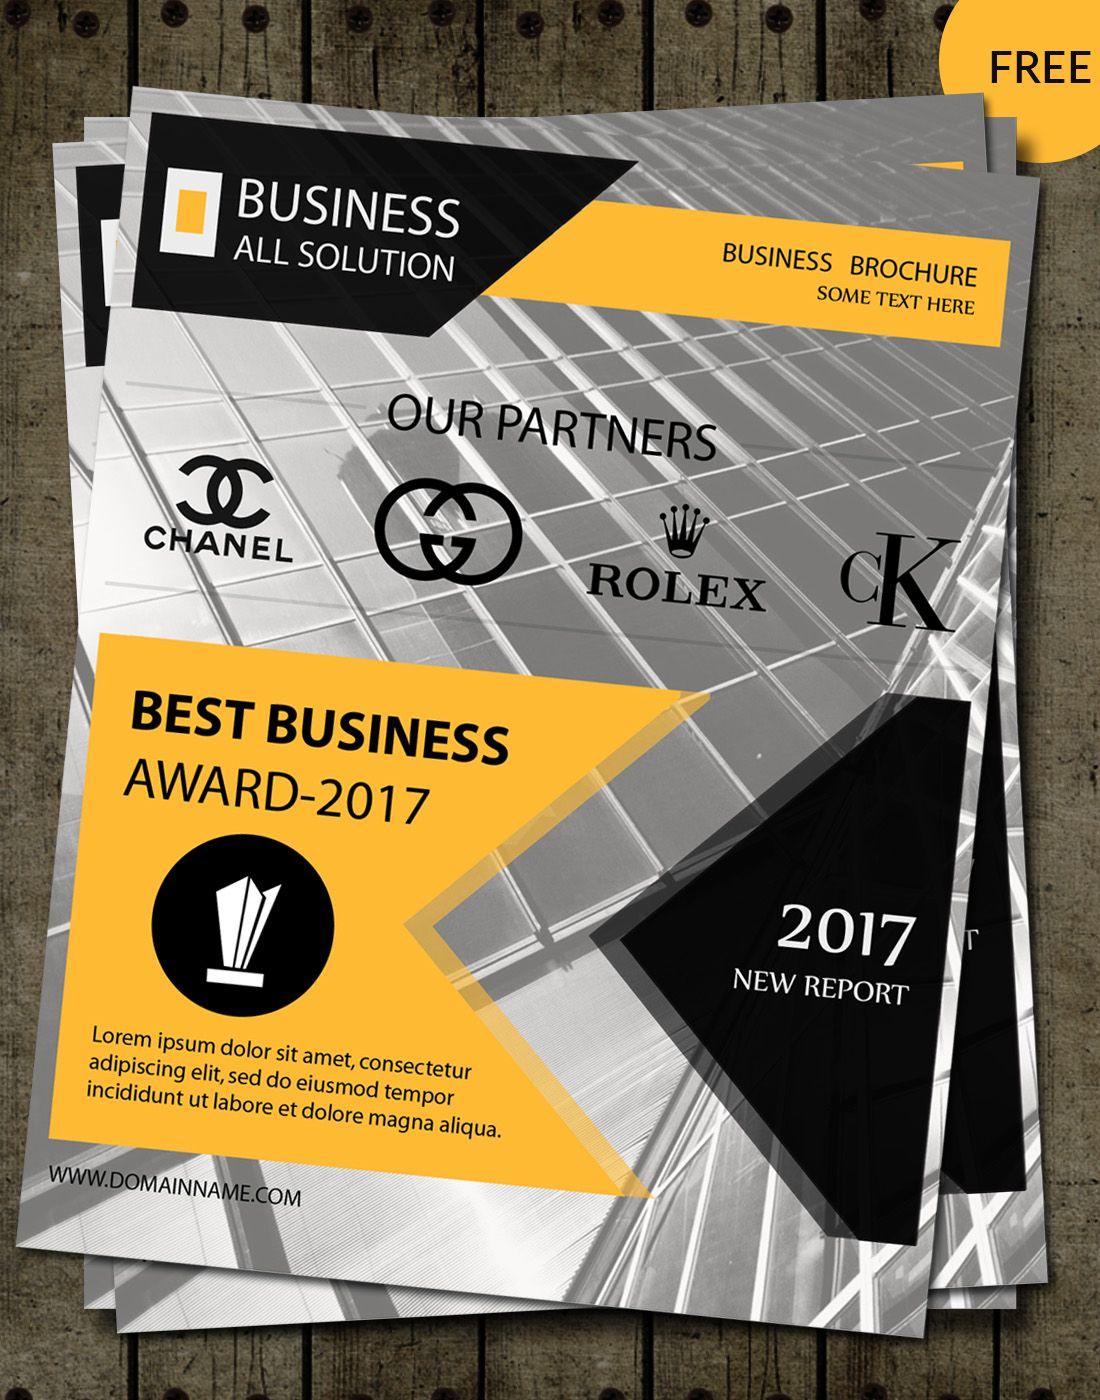 award brochure templates | brochure Design | Pinterest | Brochure ...